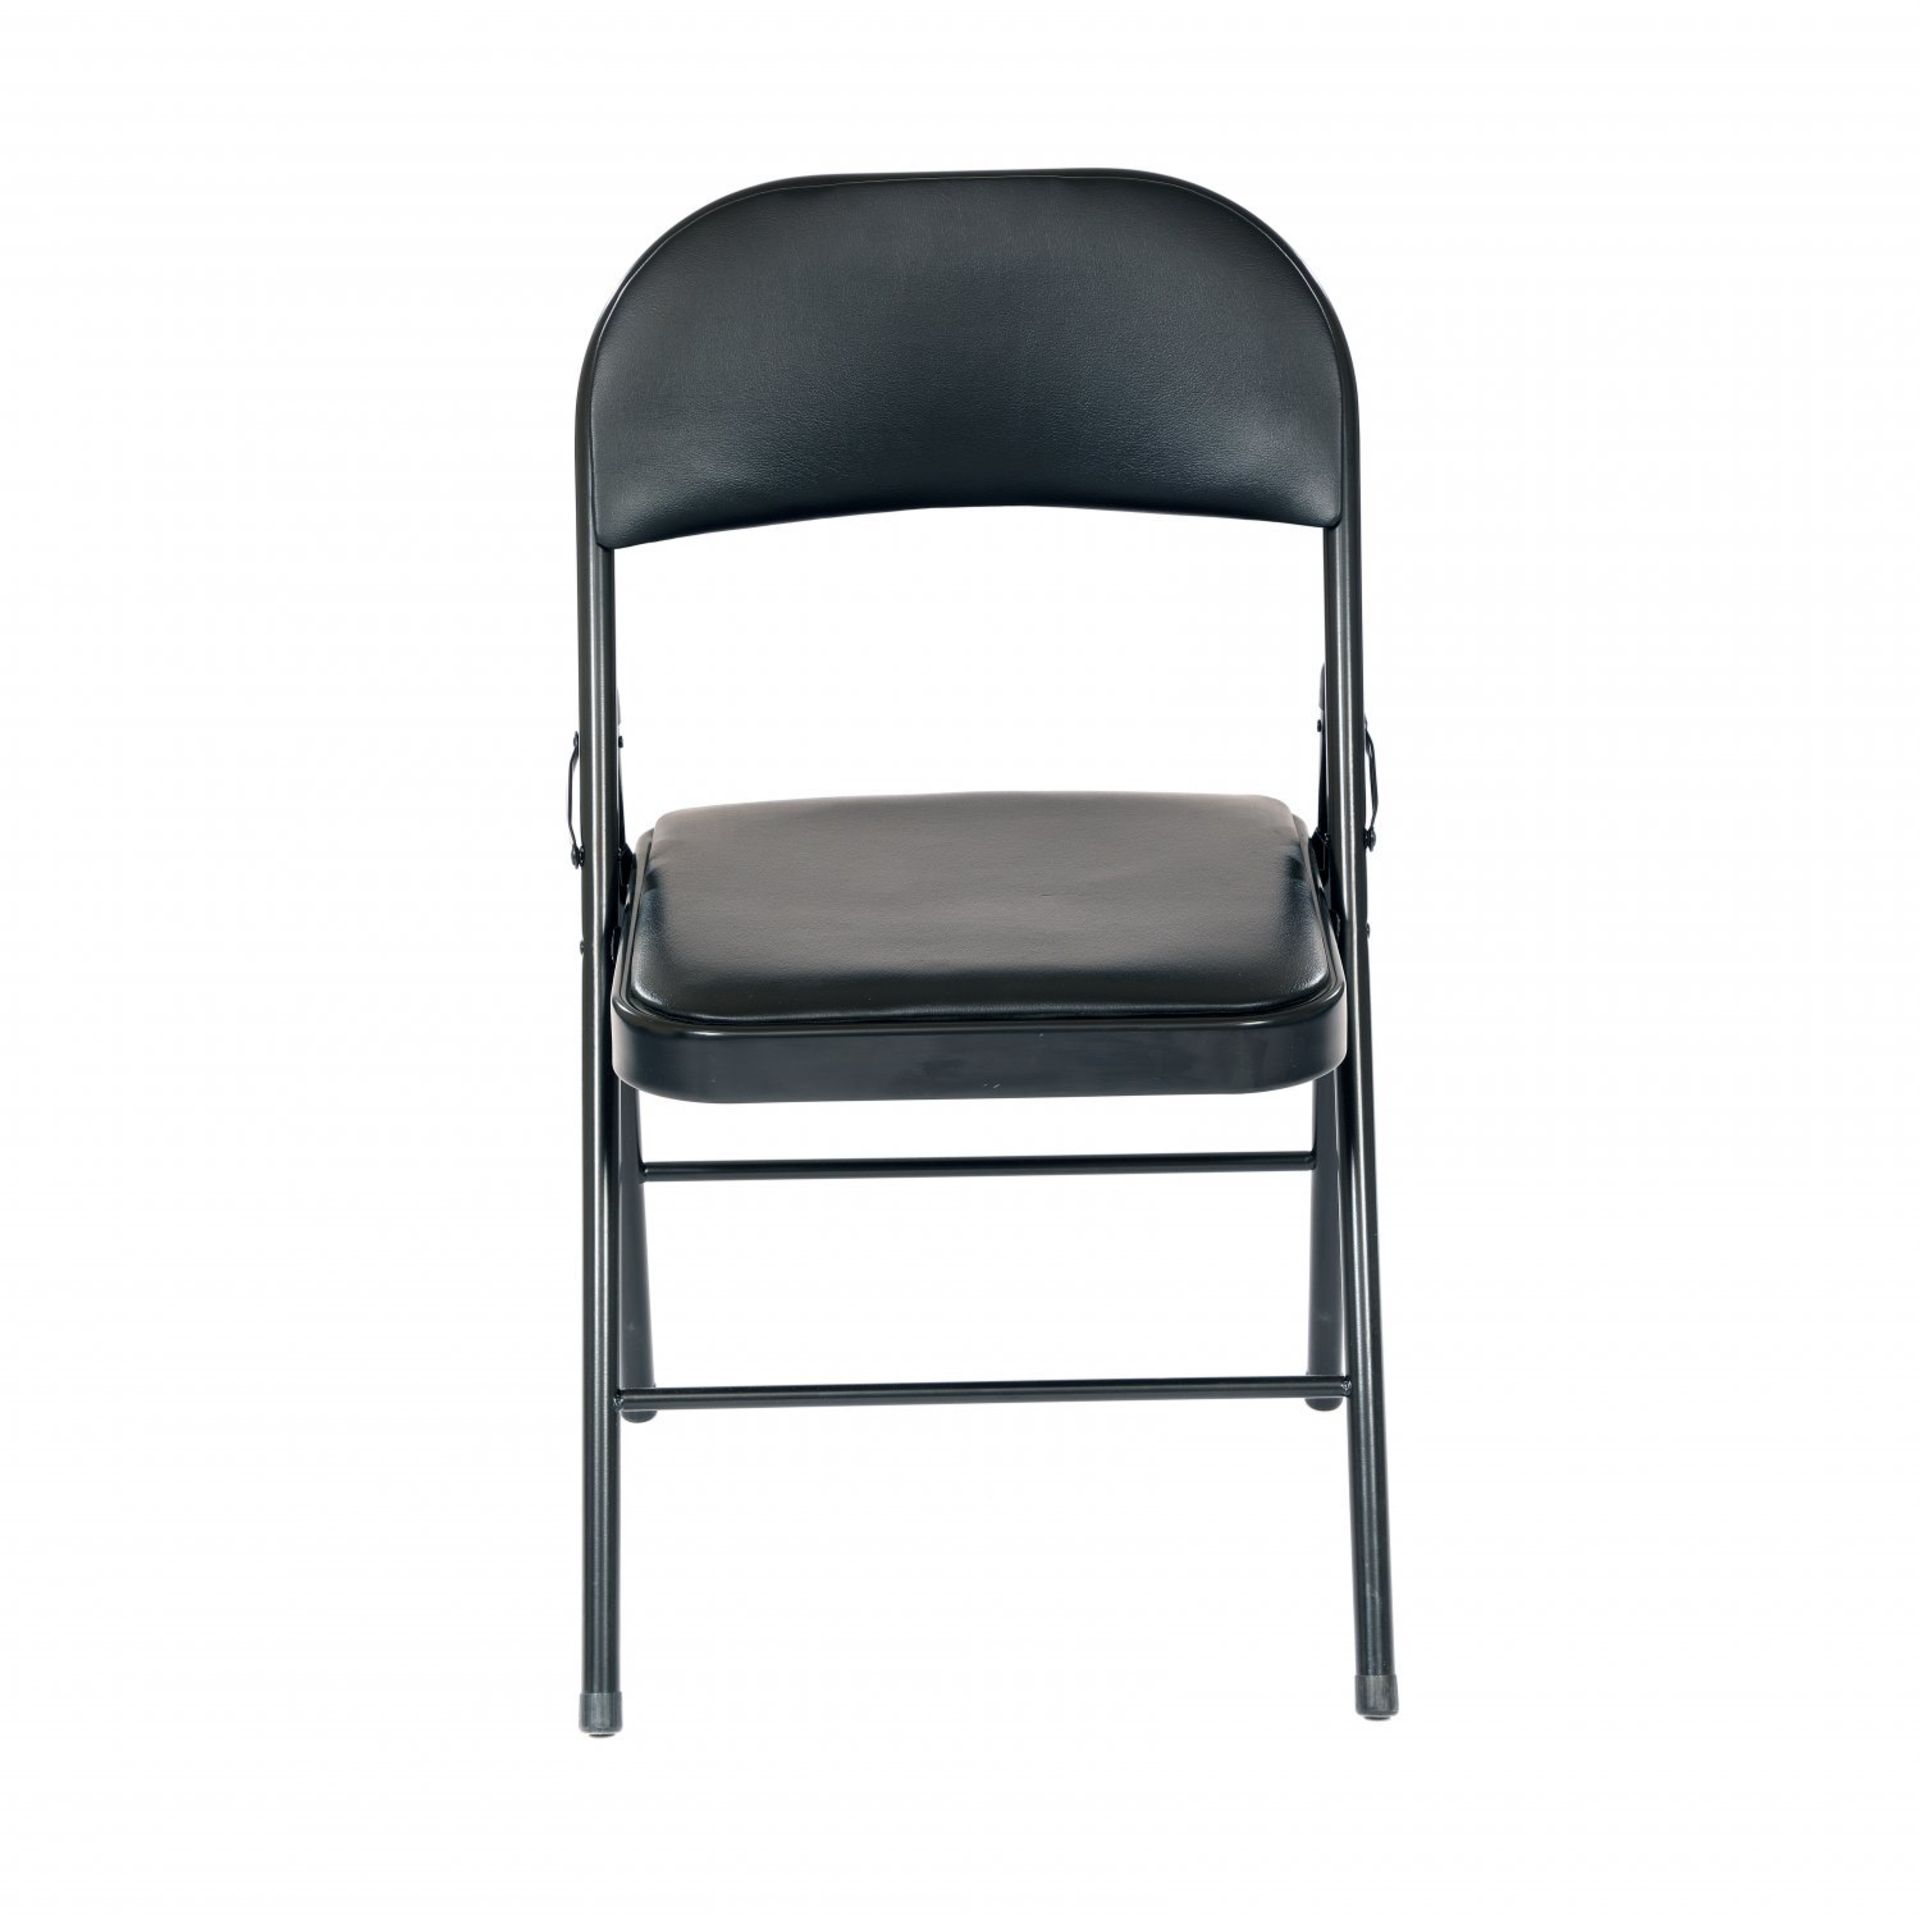 Lot 437 - (RU373) Heavy Duty Padded Folding Metal Desk Office Chair Seat The folding seat is incredibl...